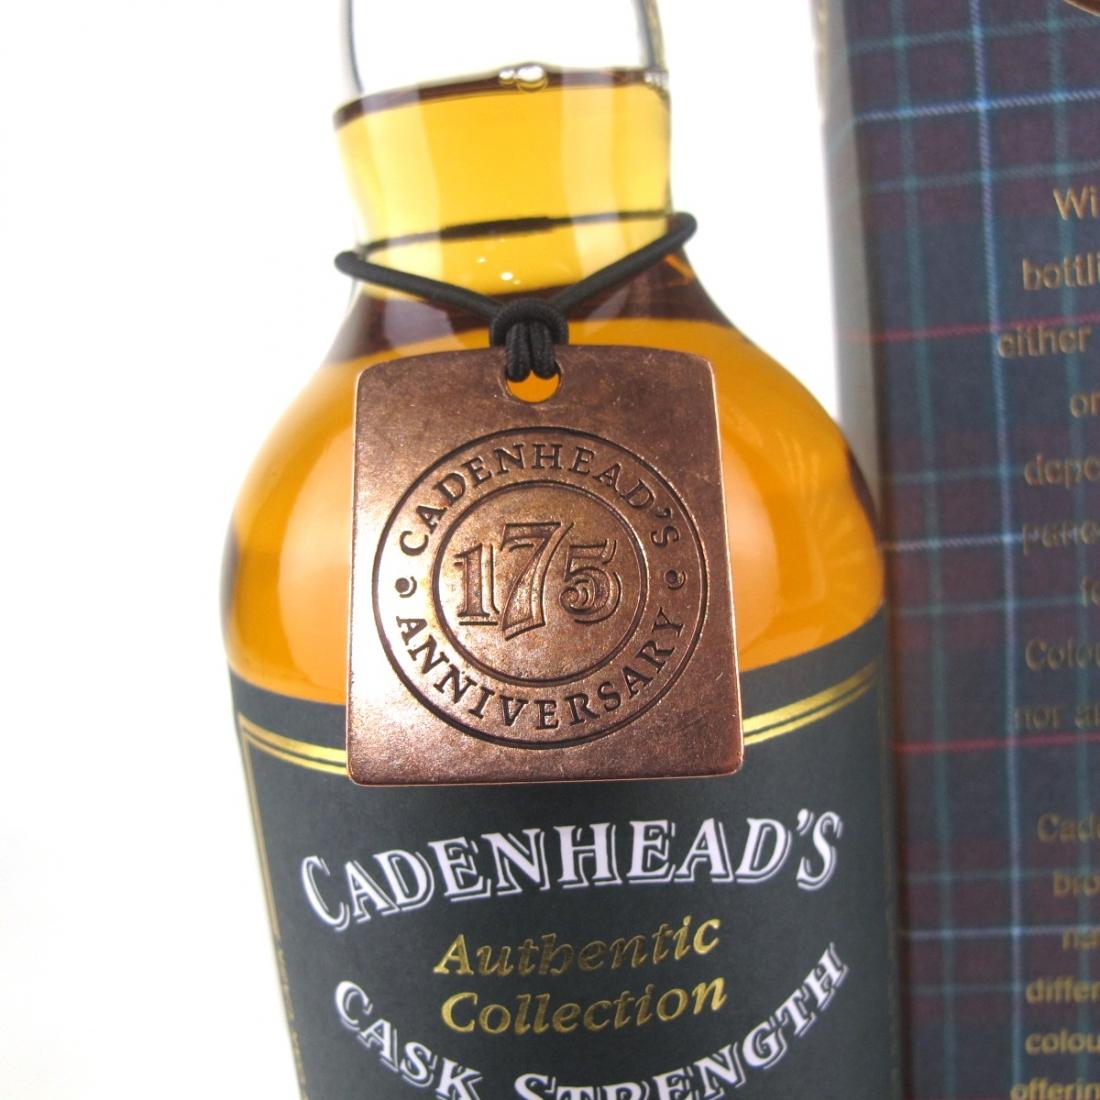 Tormore 1984 Cadenhead's 33 Year Old